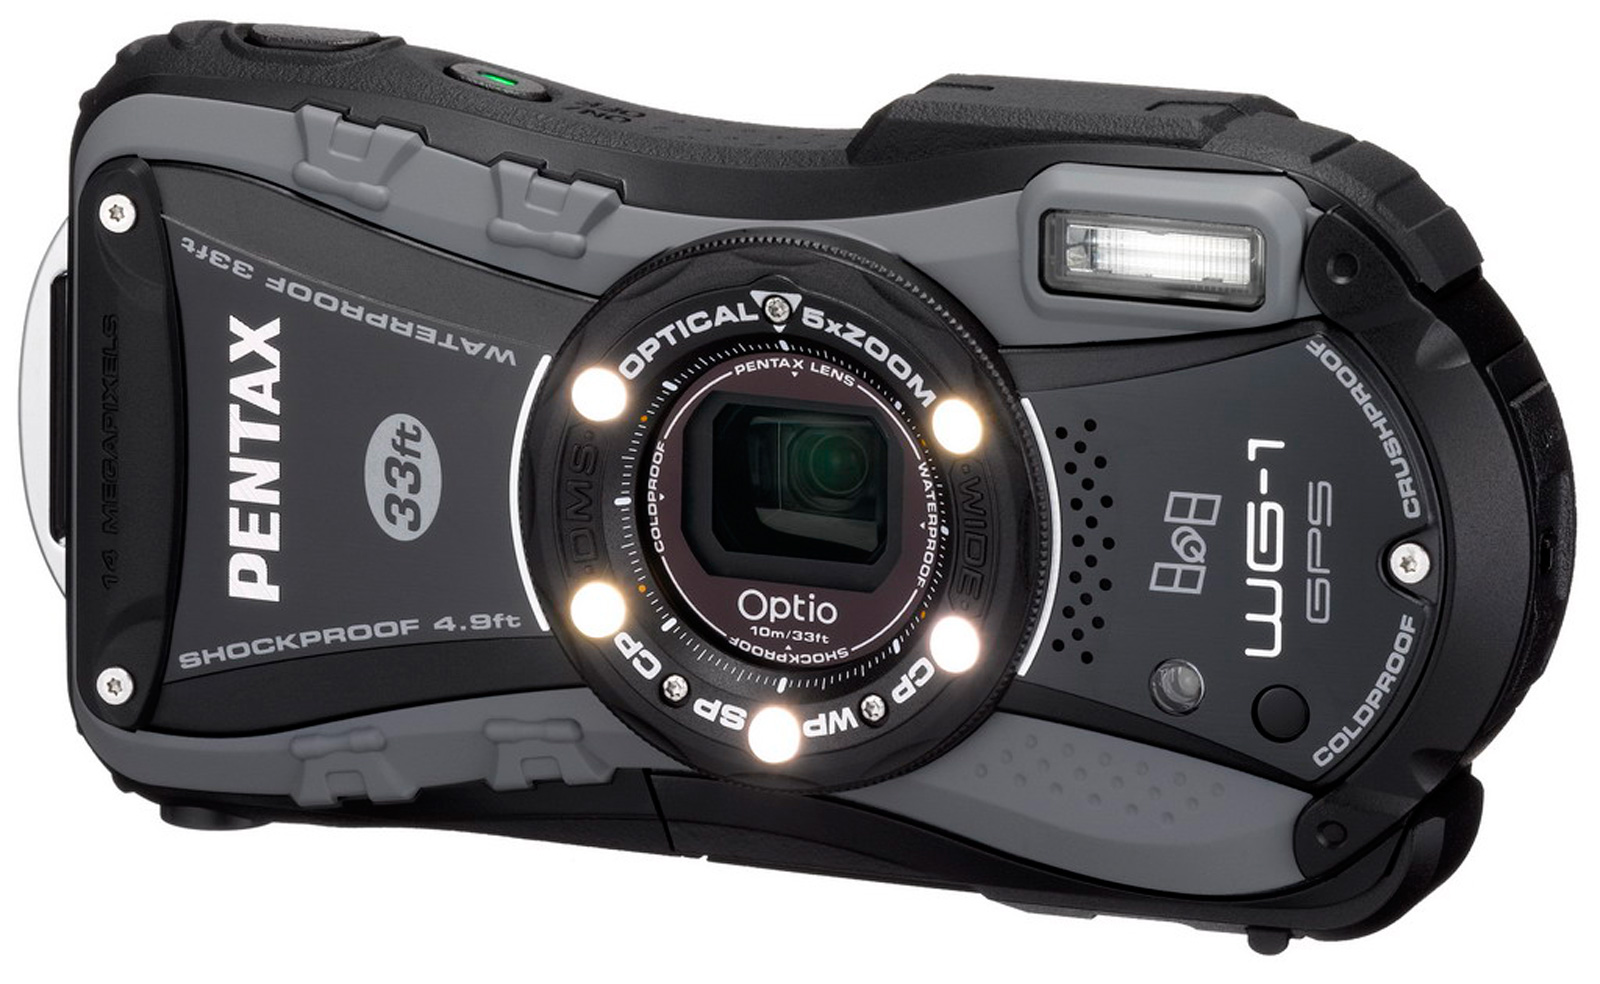 pentax optio wg 1 and pentax optio wg 1 gps heavy duty waterproof rh ricoh imaging co jp Optio Pentax Swivel Pentax Optio 30